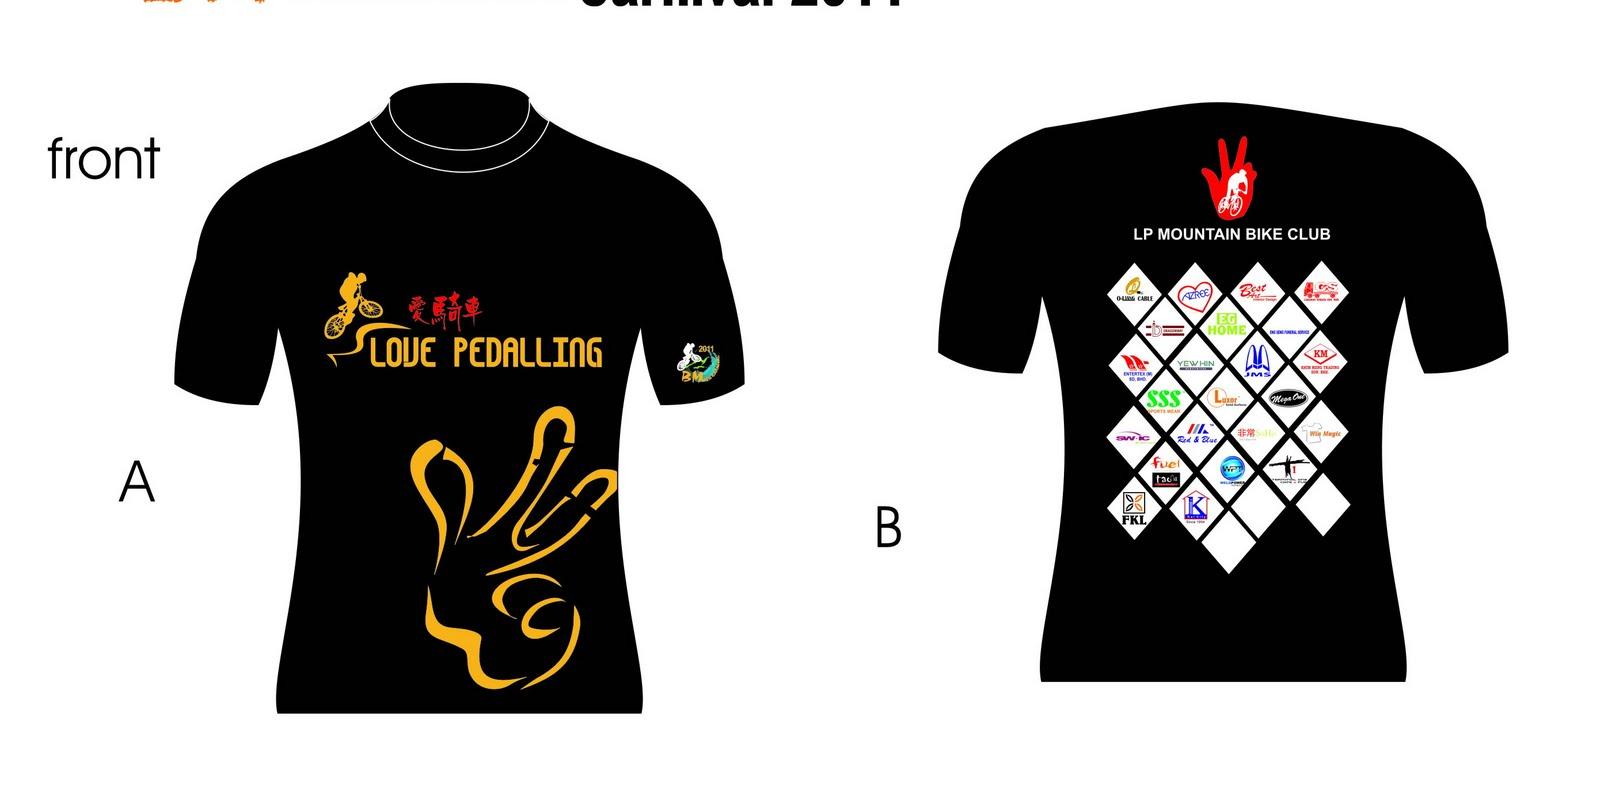 BM MTB CARNIVAL 2011: T-shirt Design